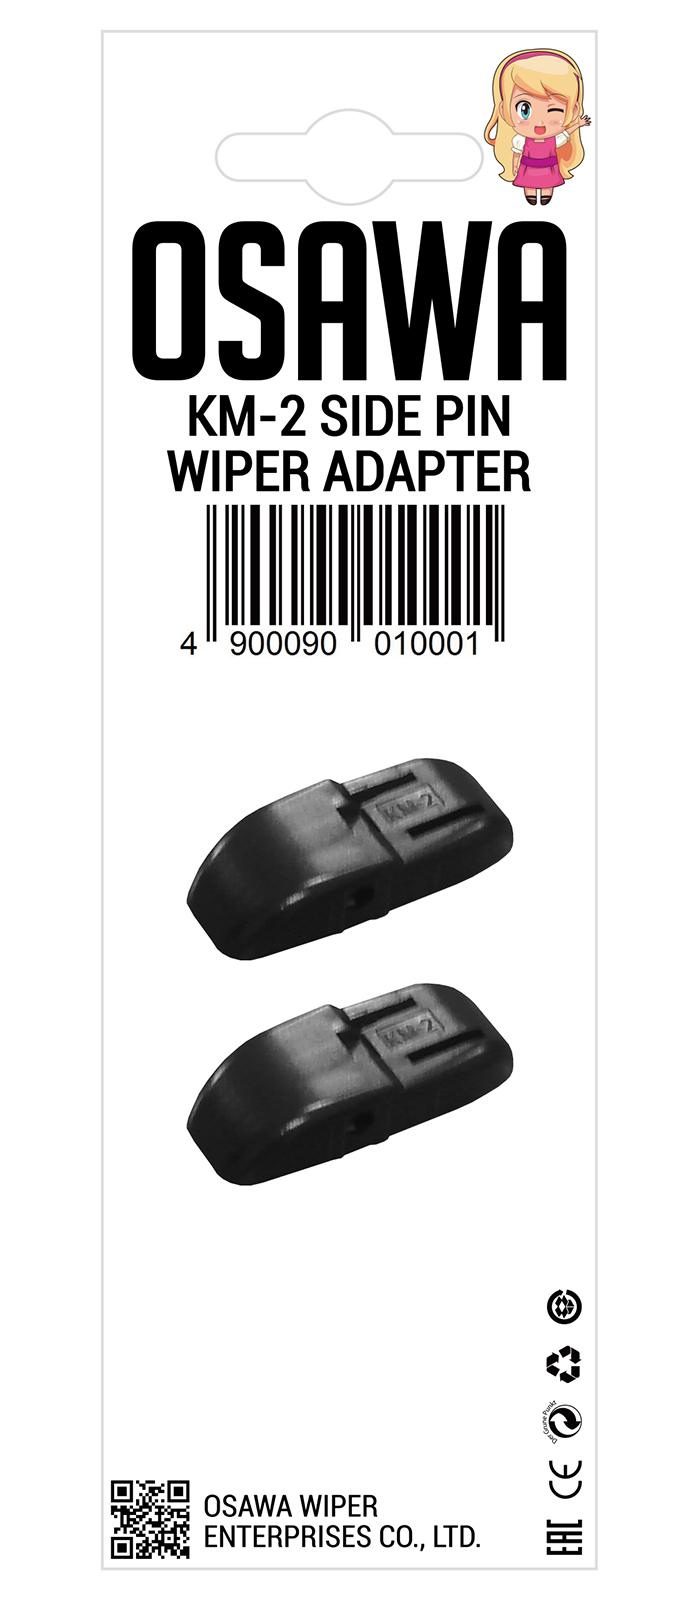 Купить Адаптеры KM-2 для типа крепления щеток стеклоочистителя Side Pin, Osawa